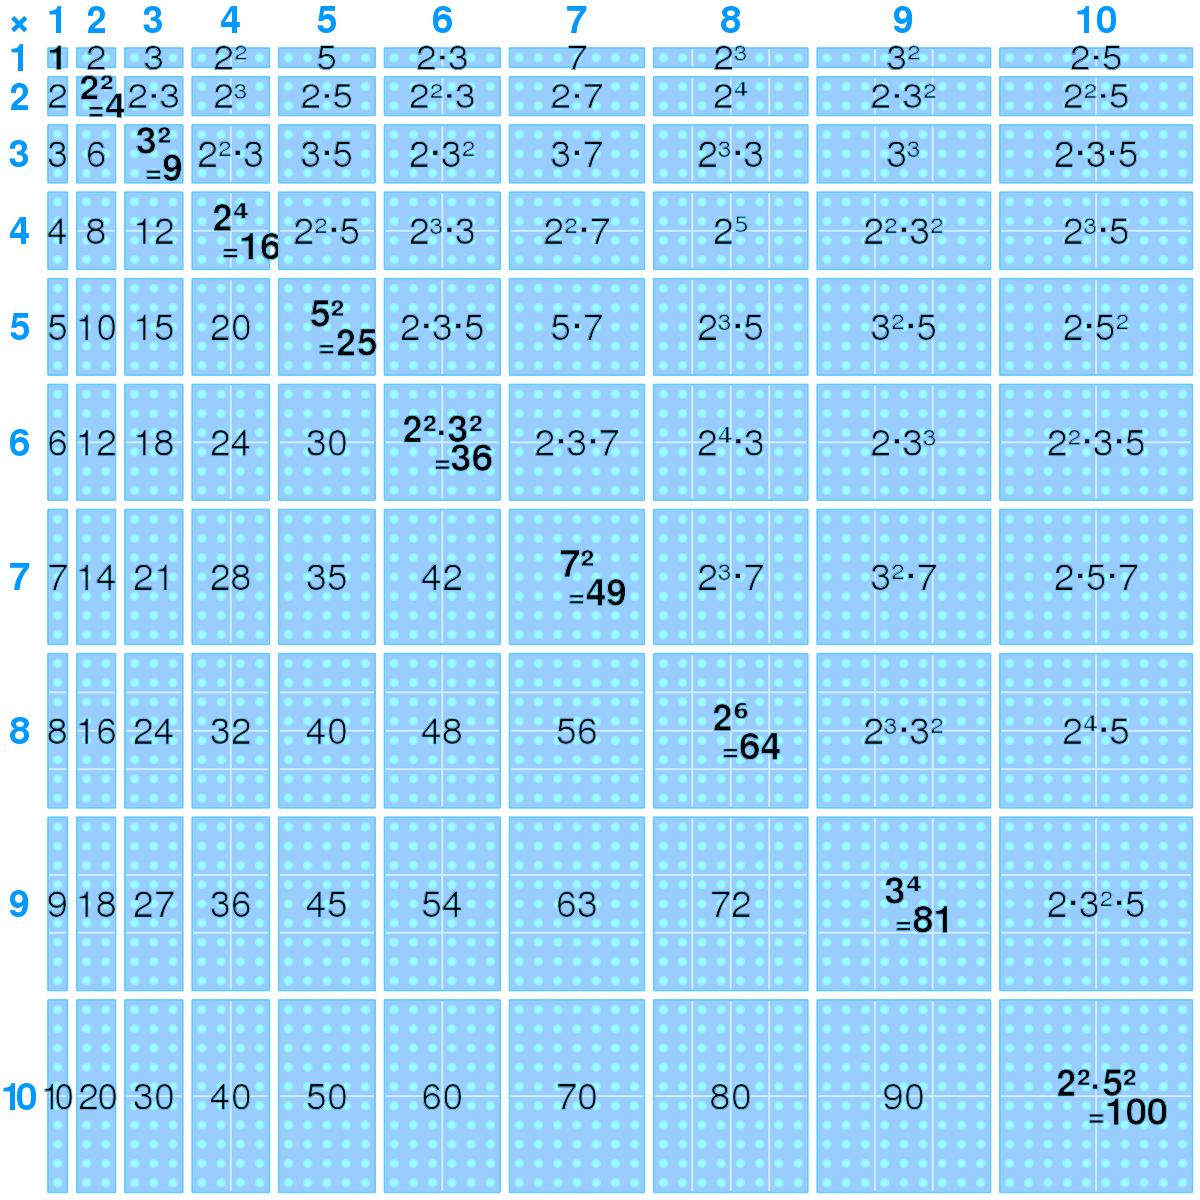 Multiplication Table - Wikipedia